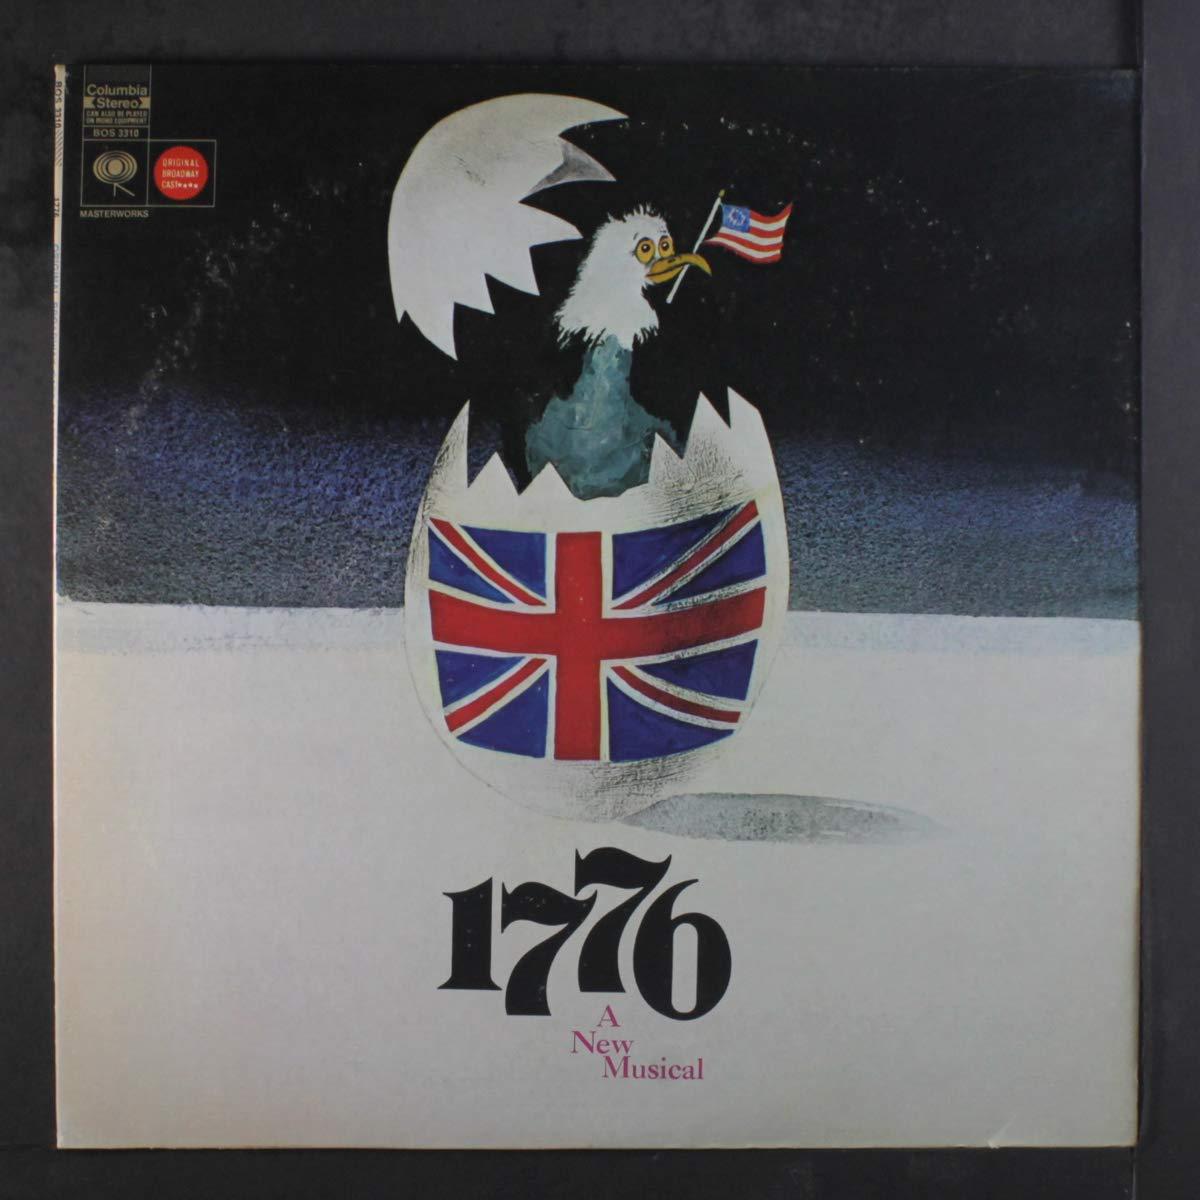 1776 A New Musical